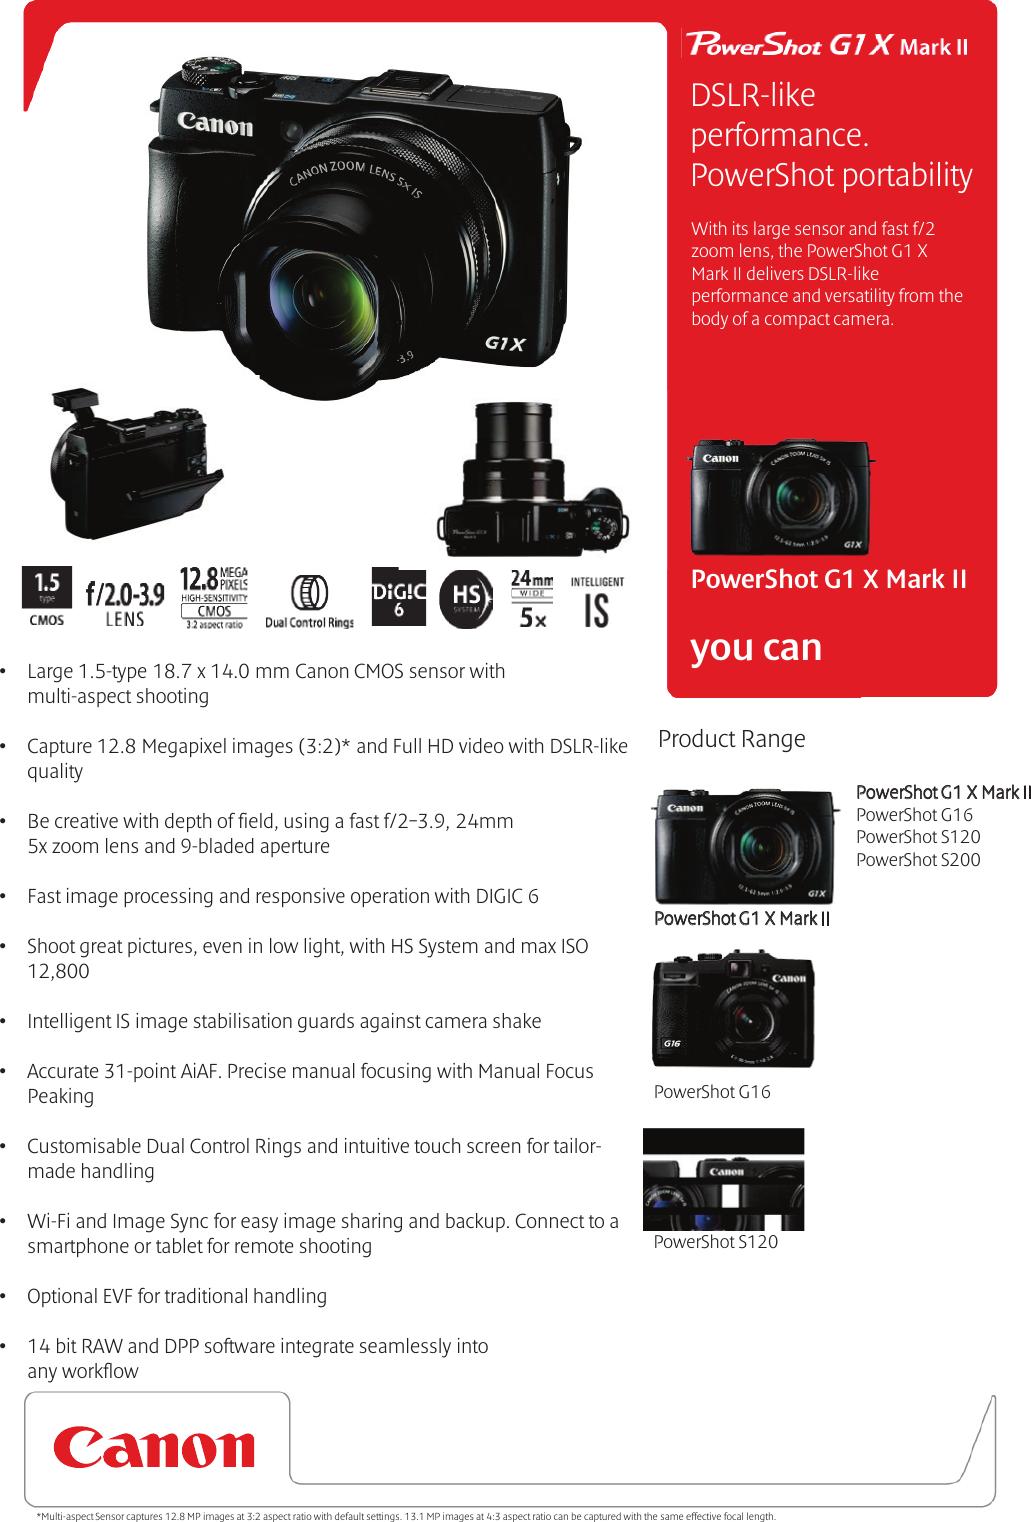 Canon powershot g1x mk iii printed user manual guide instructions.